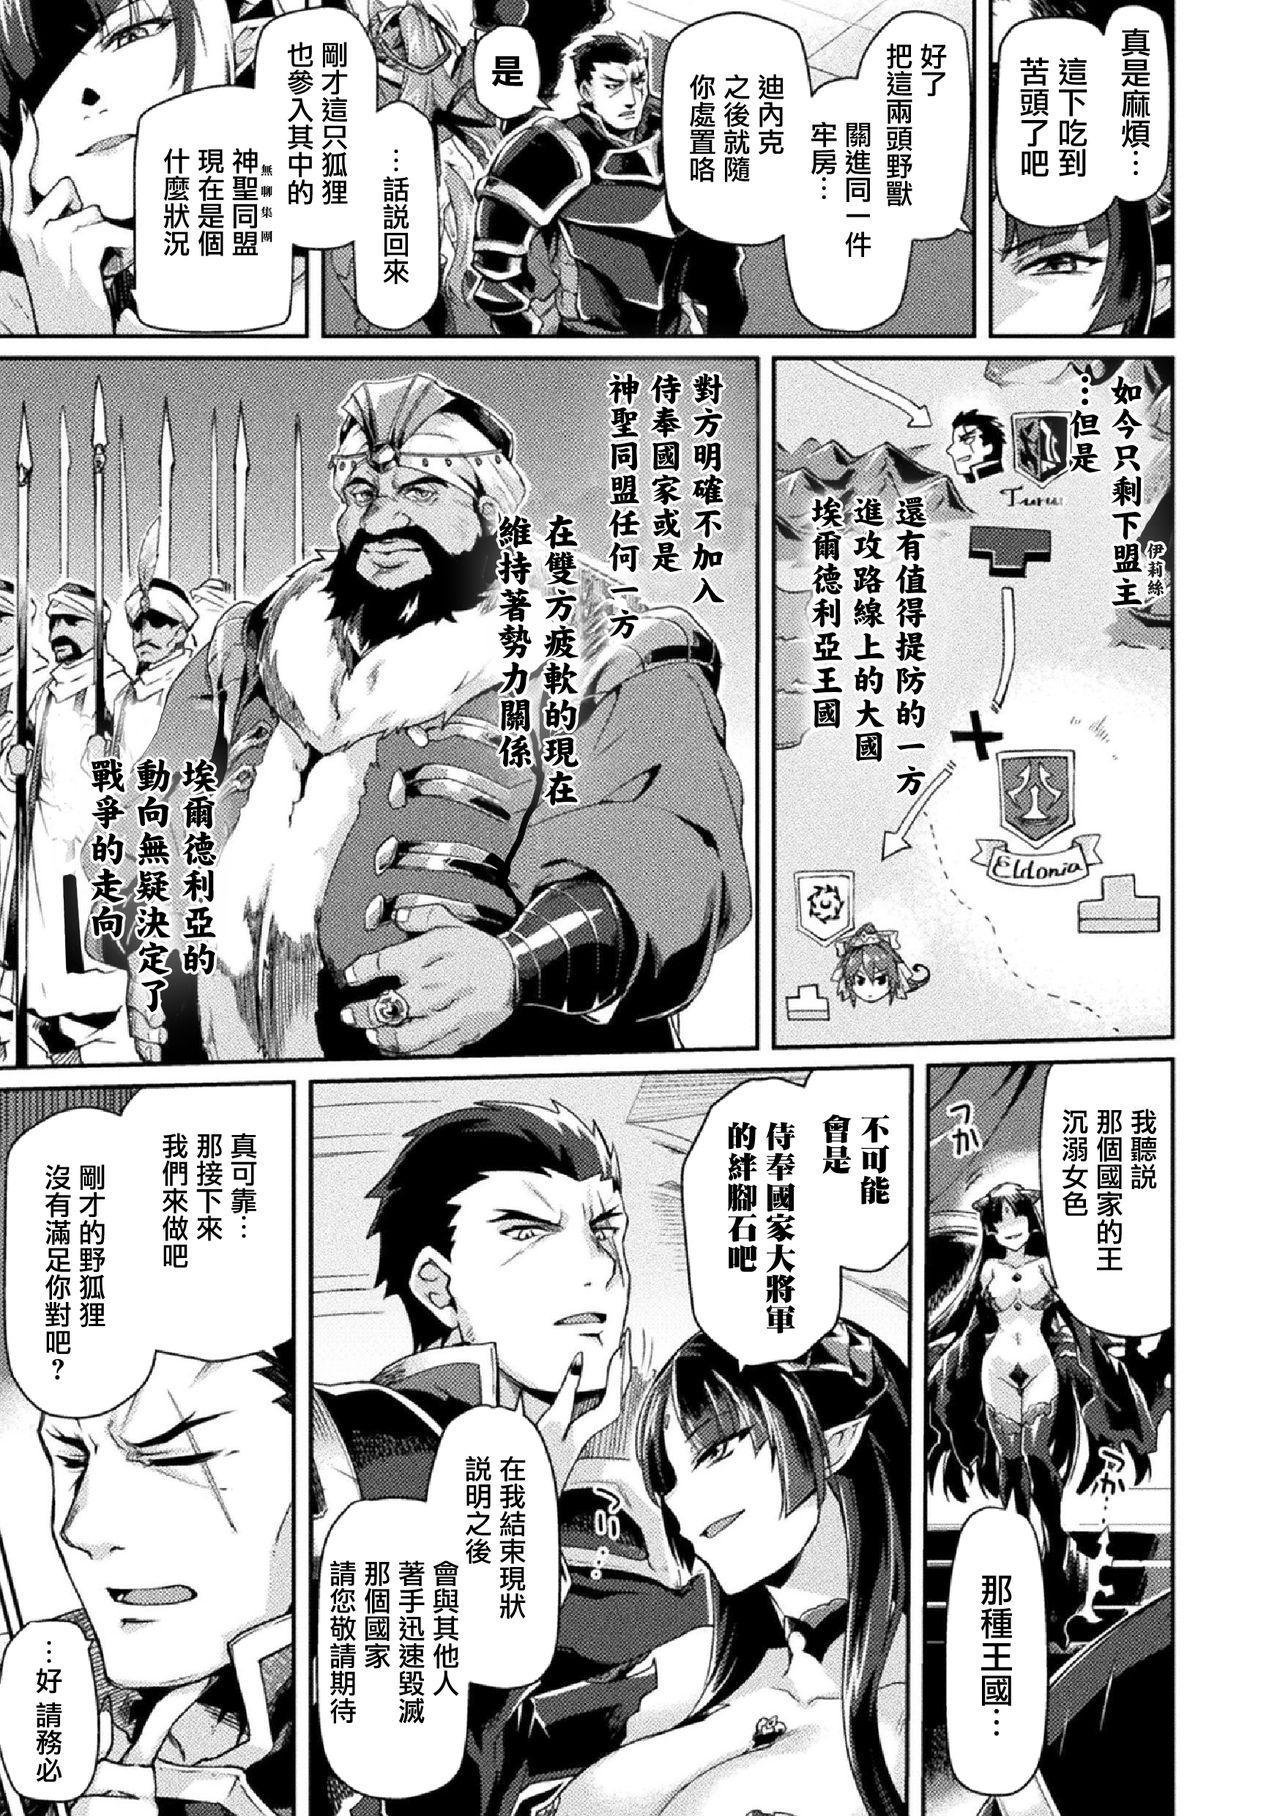 [Tsukitokage] Kuroinu II ~Inyoku ni Somaru Haitoku no Miyako, Futatabi~ THE COMIC Chapter 5 (Kukkoro Heroines Vol. 5) [Digital] [Chinese] [鬼畜王漢化組] [Digital] 19